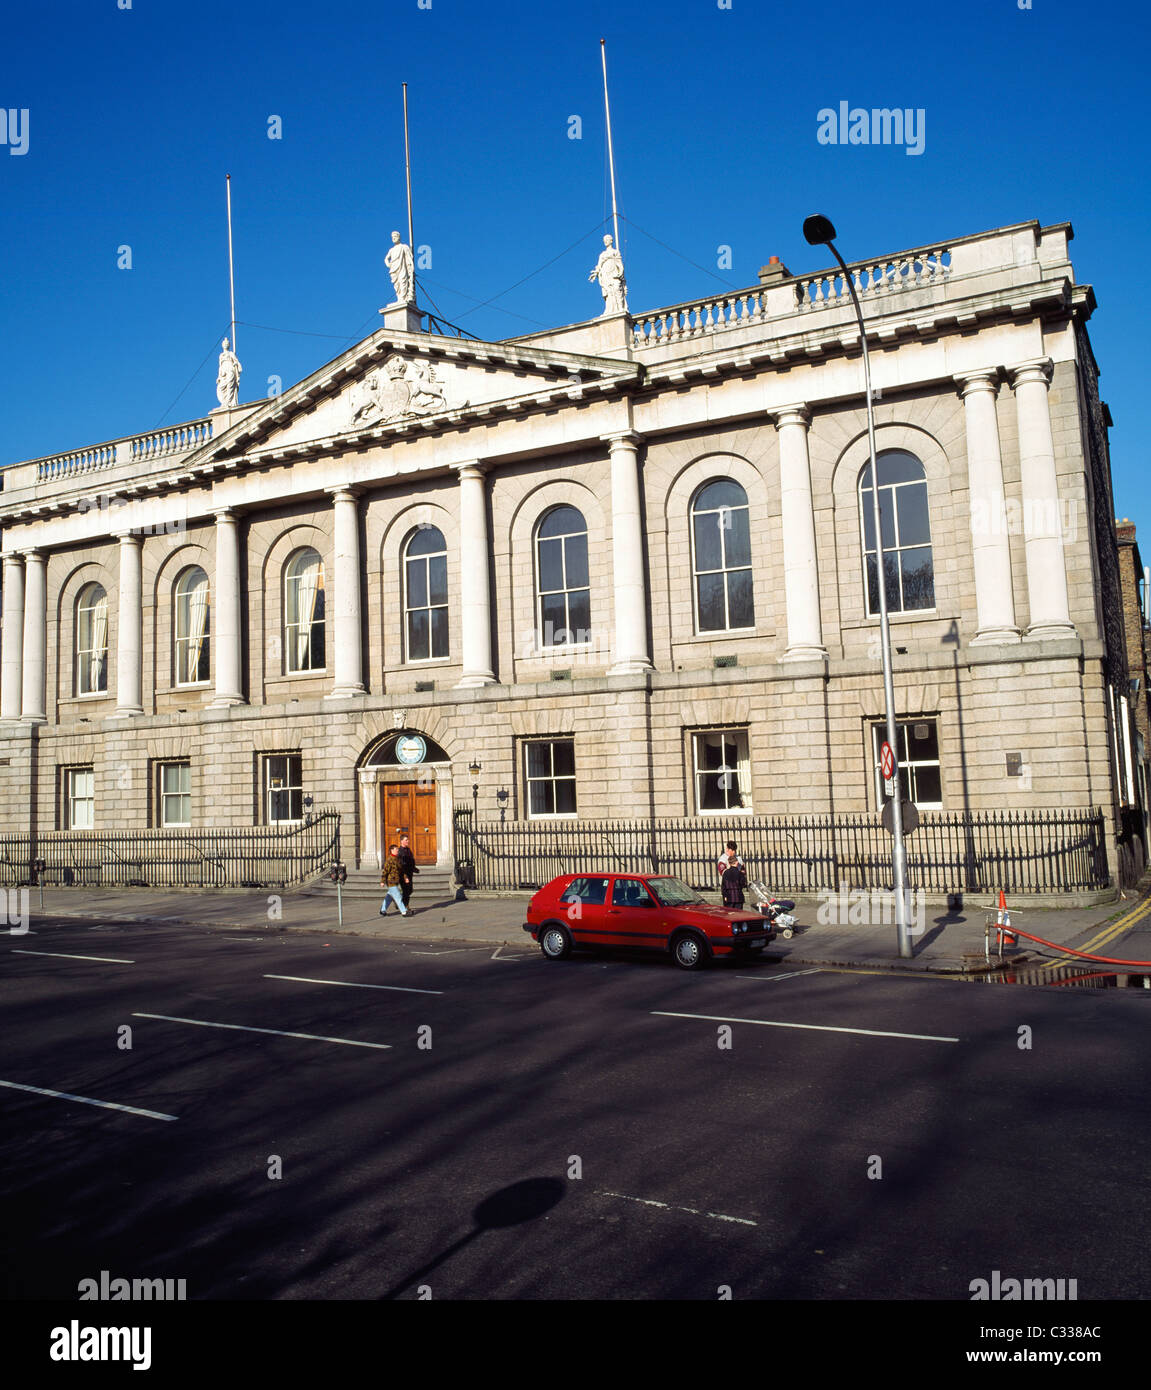 Dublin City, Co Dublin, Ireland, The Royal College Of Surgeons, St. Stephens Green - Stock Image